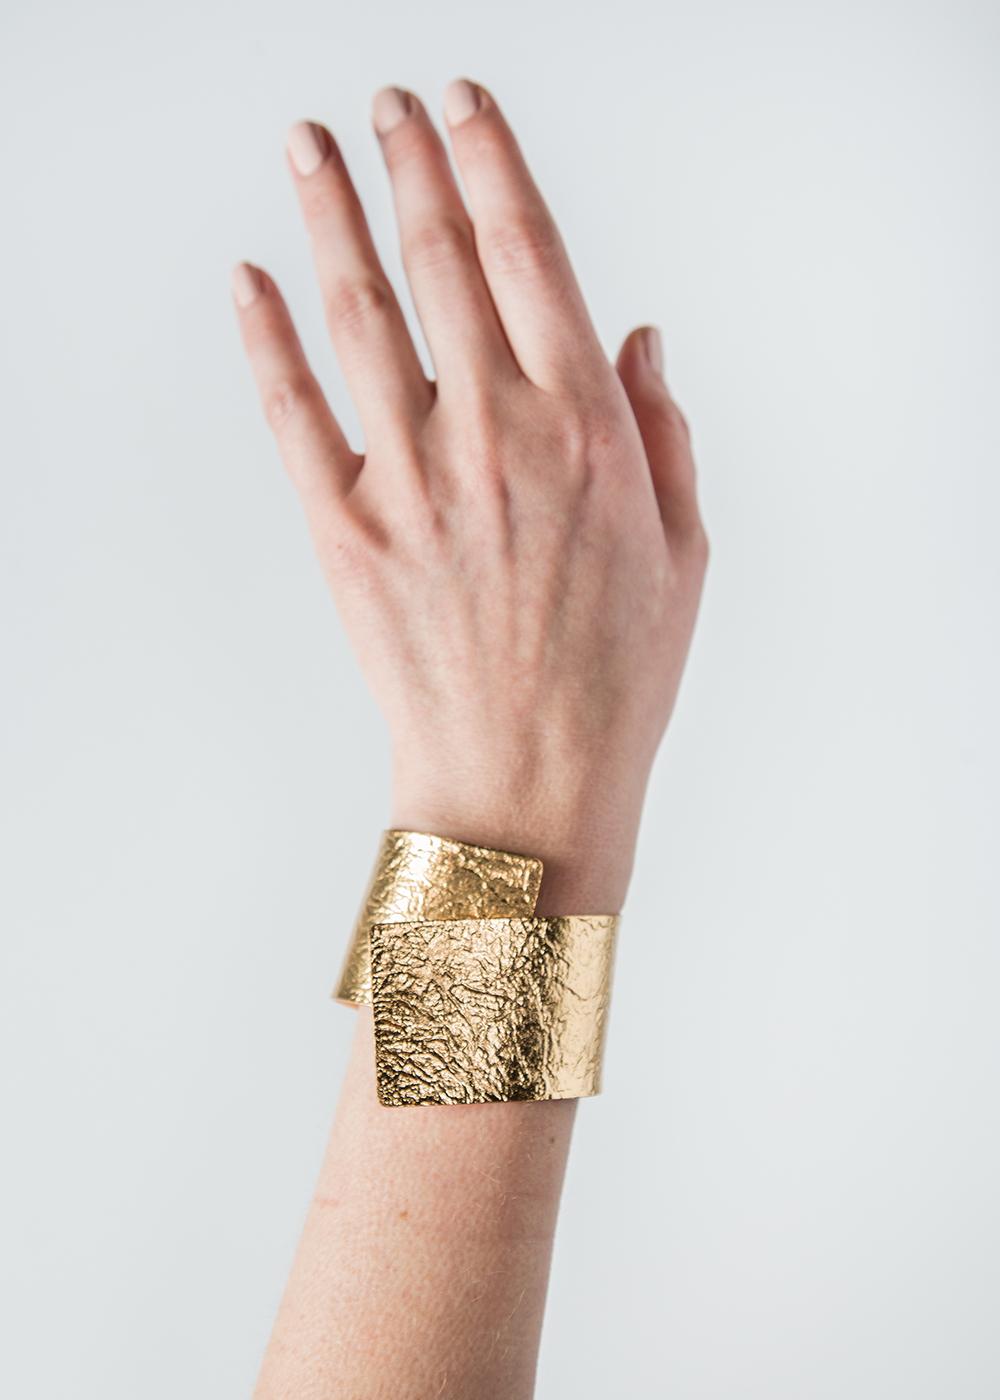 Tin Breath Bendable Bracelet in Gold  $225